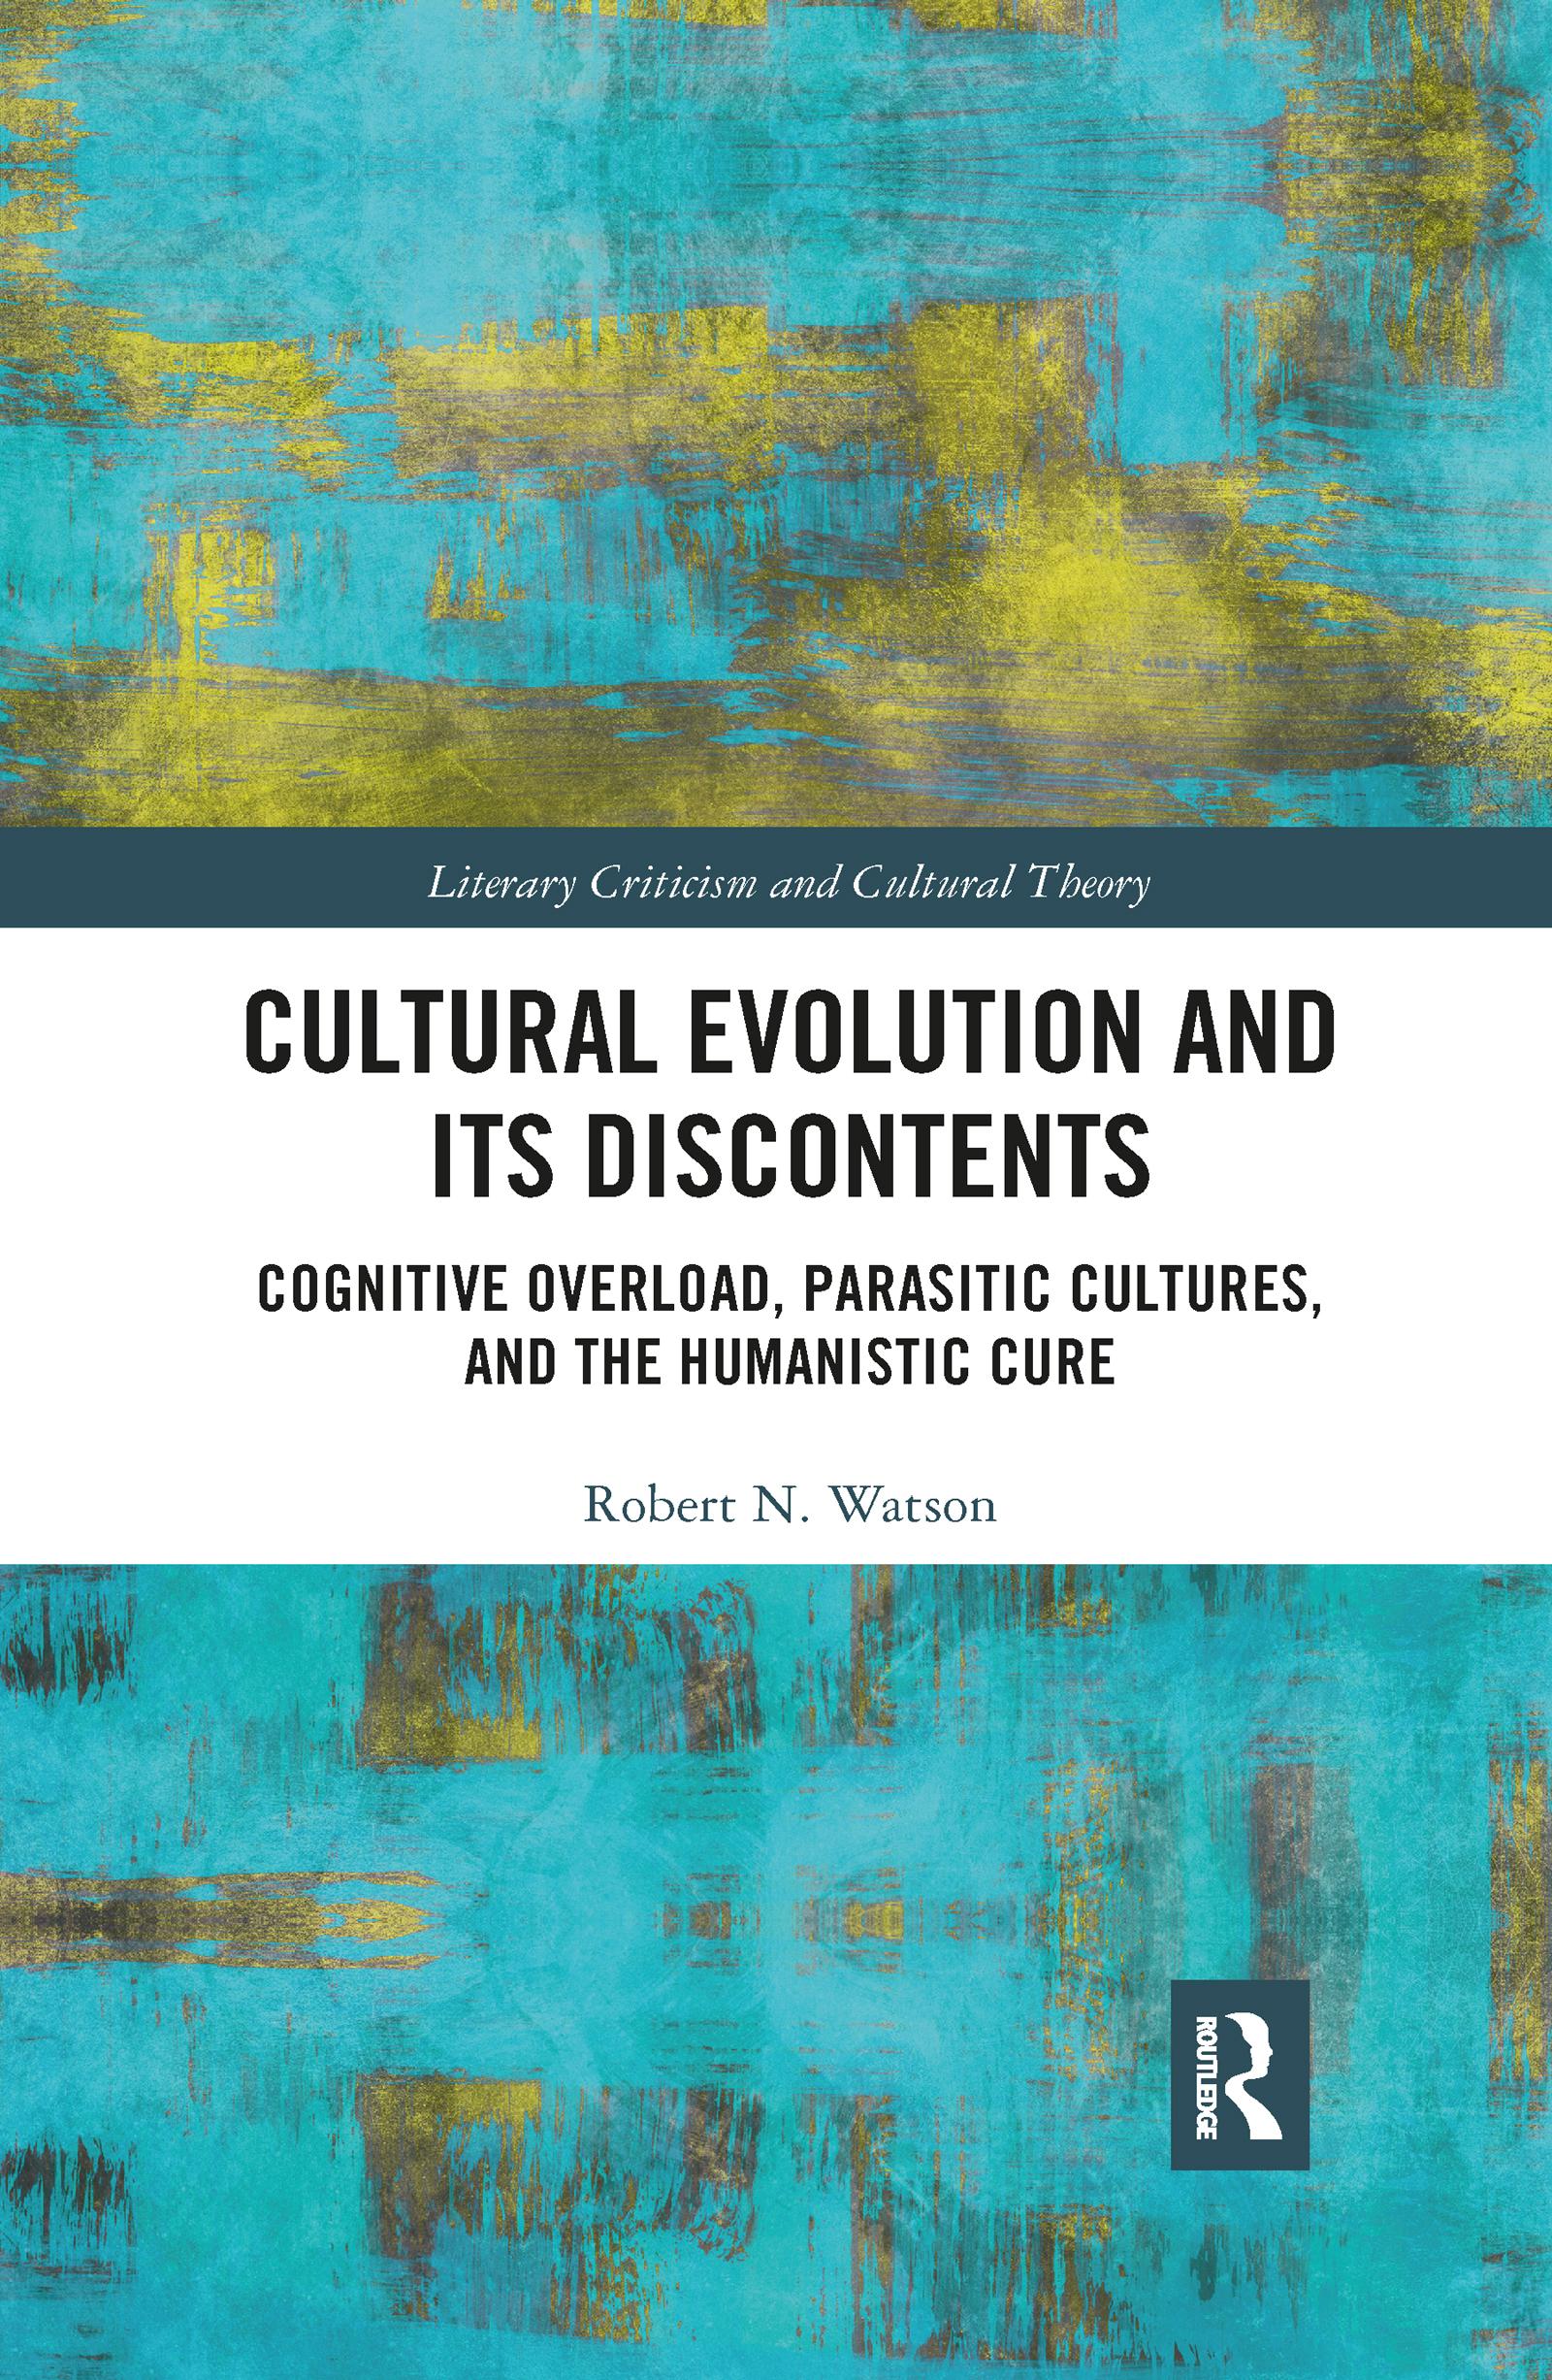 Cultural Evolution and its Discontents